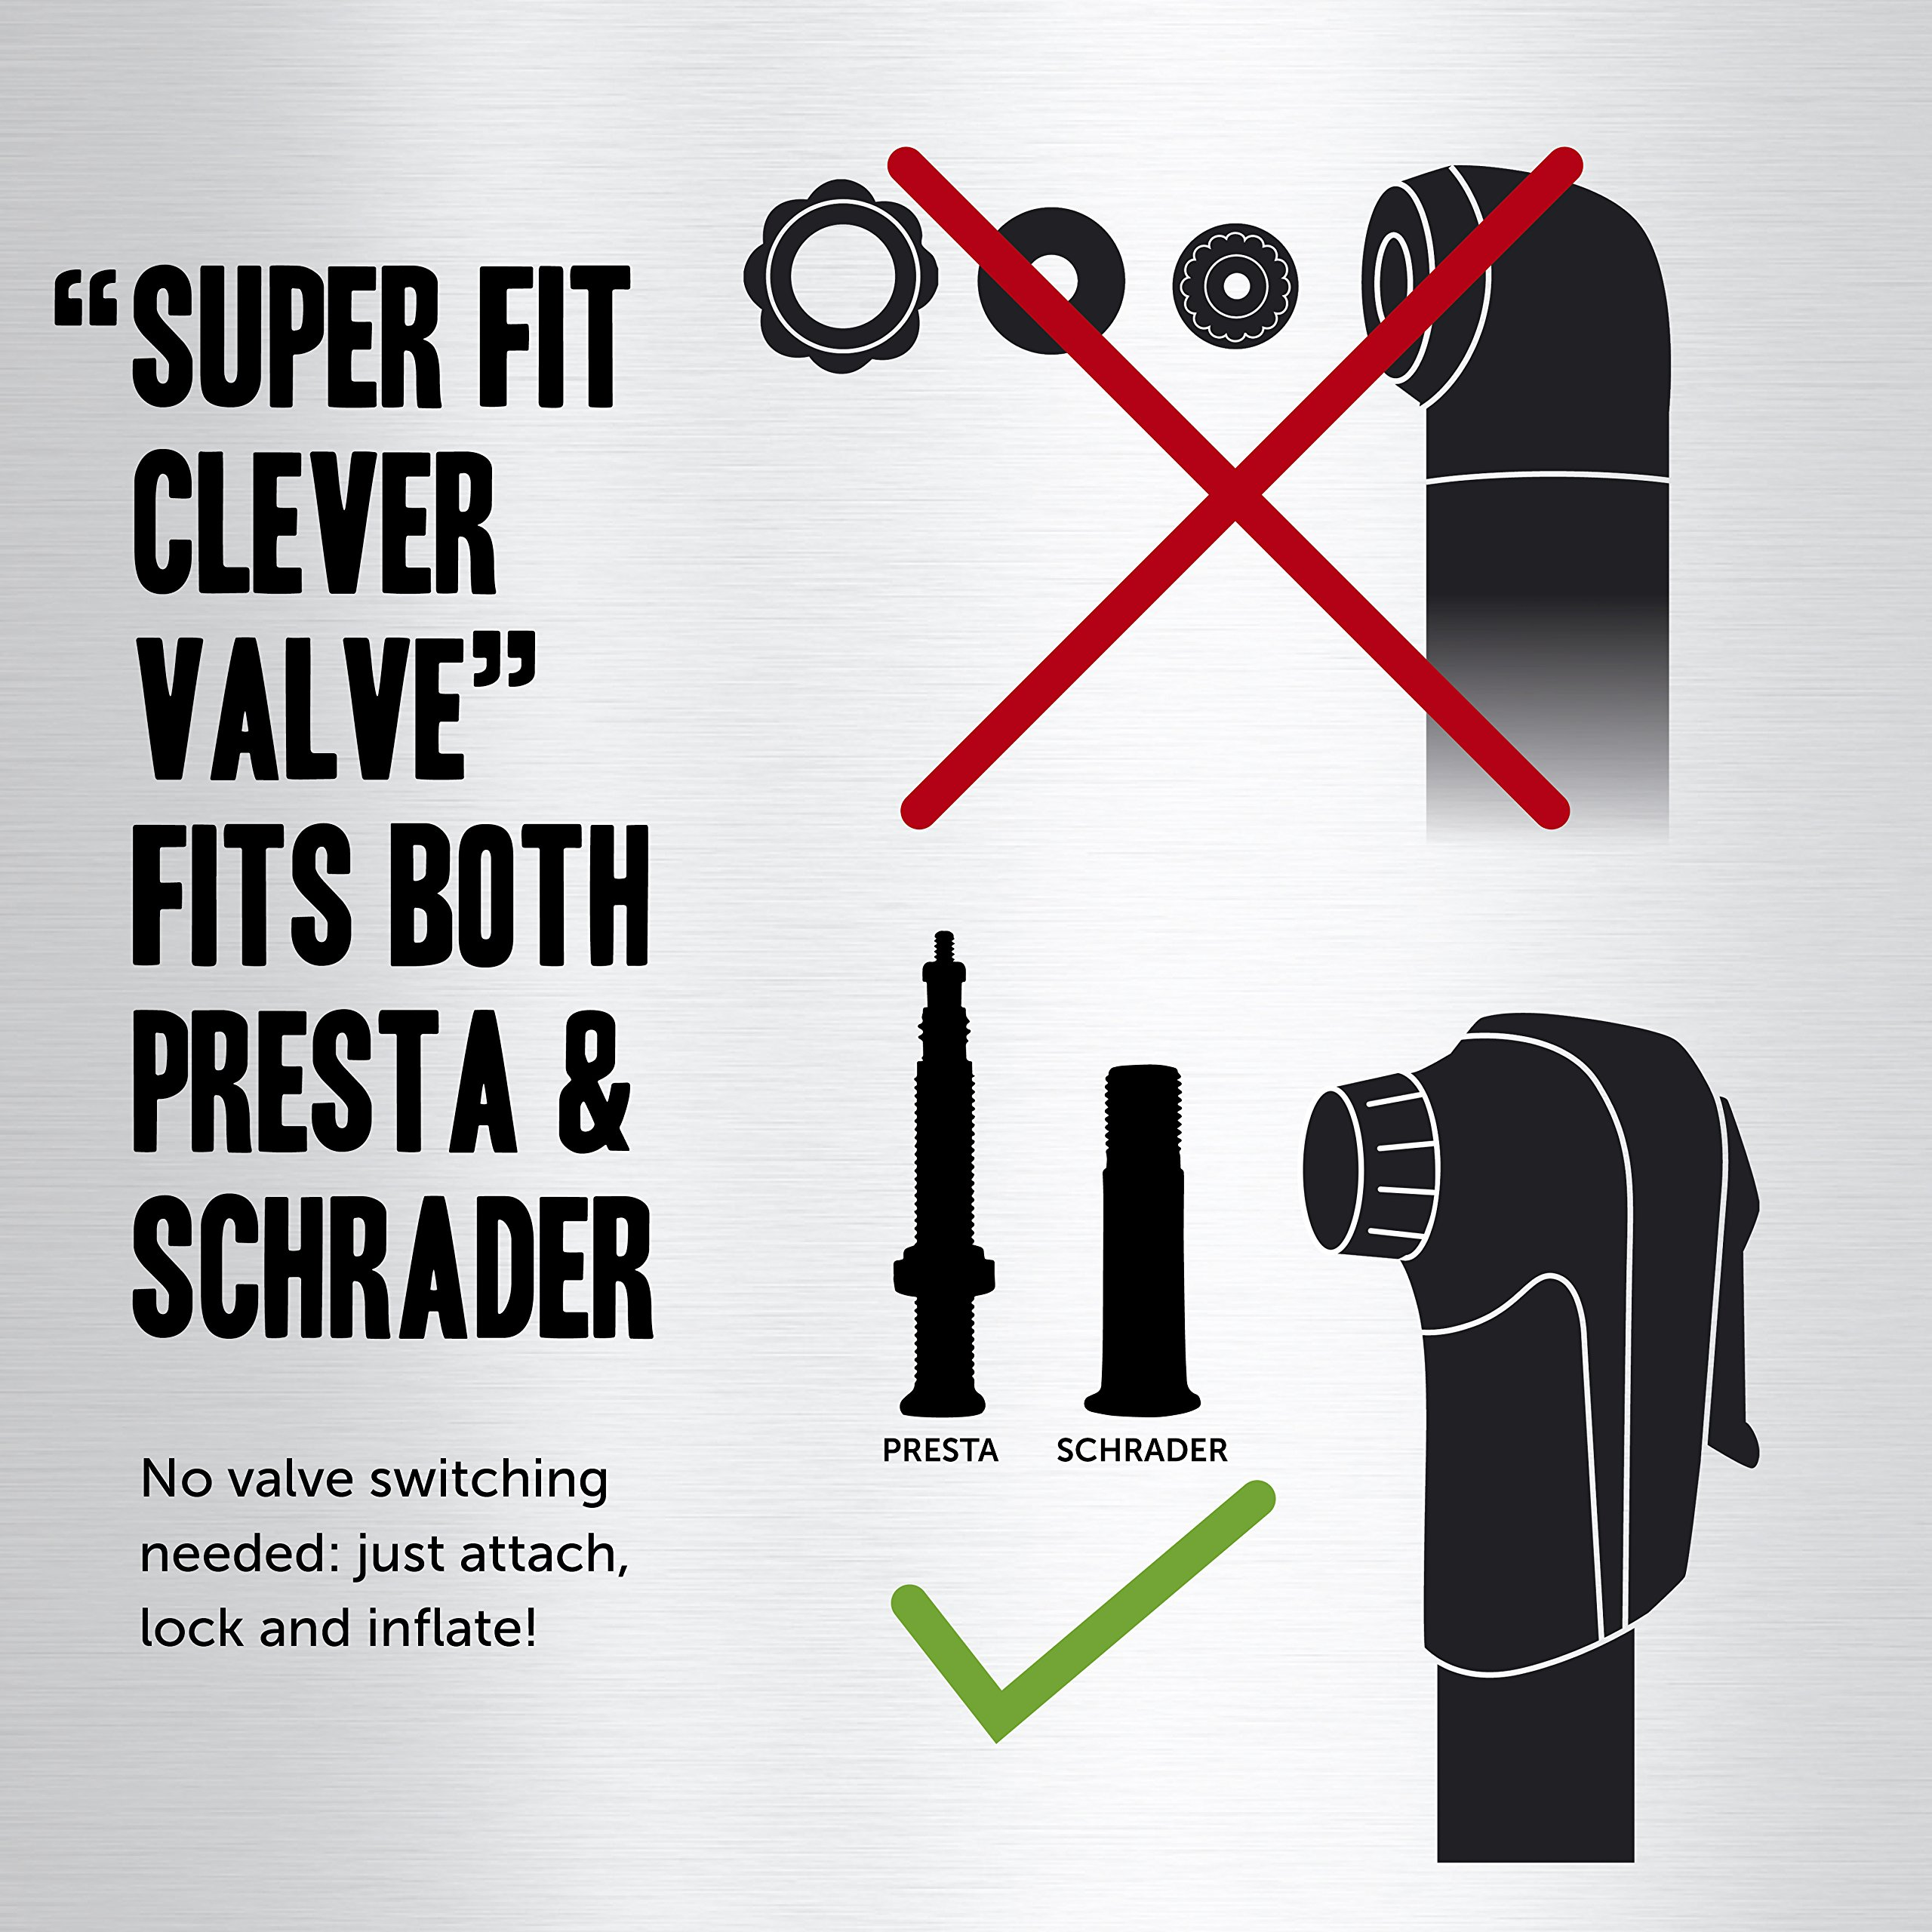 Vibrelli Mini Bike Pump & Glueless Puncture Repair Kit - Fits Presta & Schrader - 120 PSI - No Valve Changing Needed by Vibrelli (Image #6)